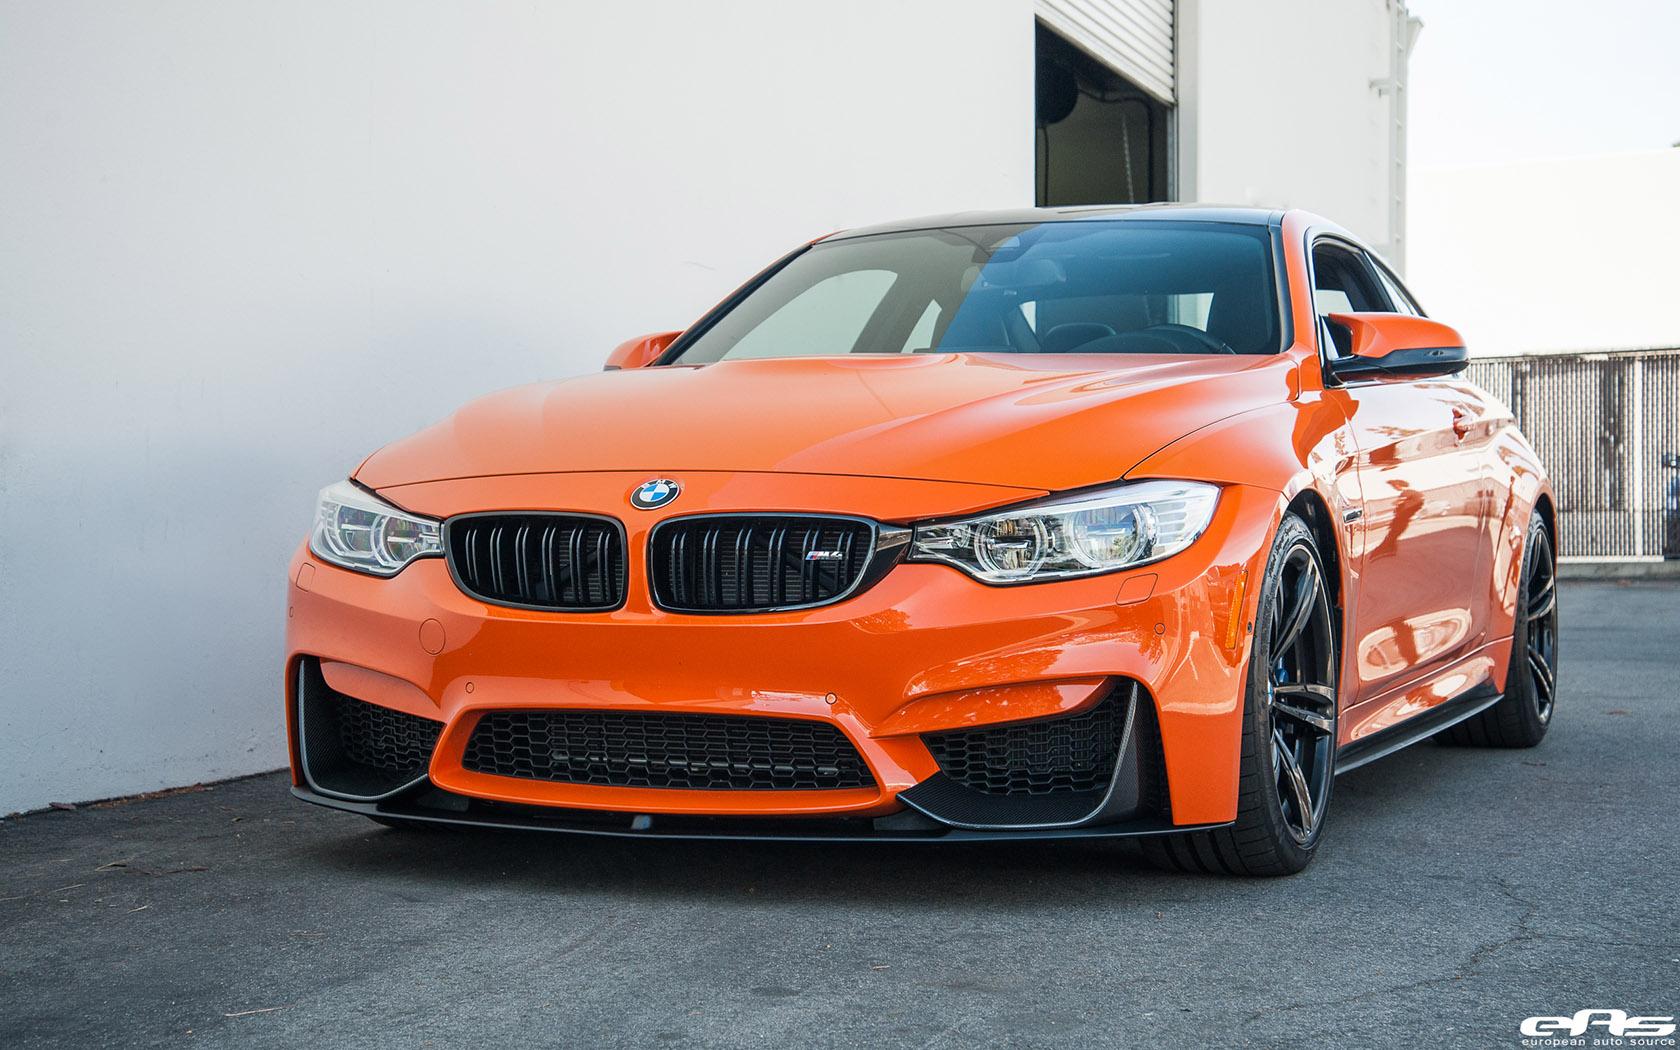 Fire Orange II BMW F82 M4 Image 17